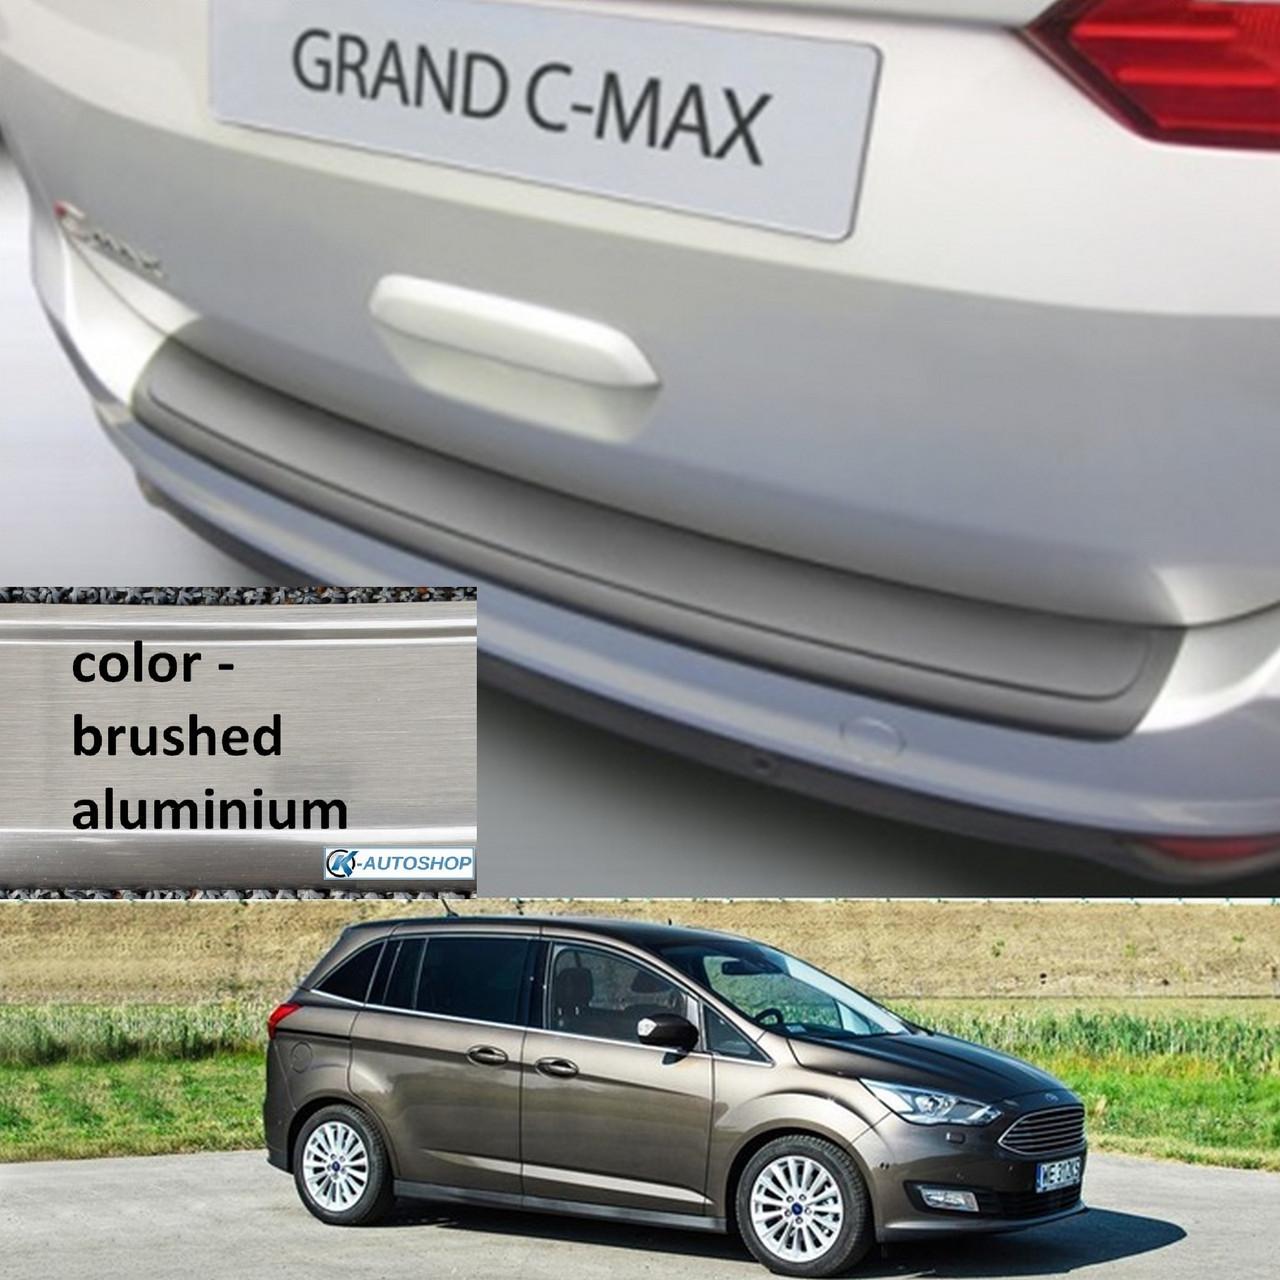 Пластиковая защитная накладка на задний бампер для Ford Grand C-Max Mk2 LIFT 2015-2019